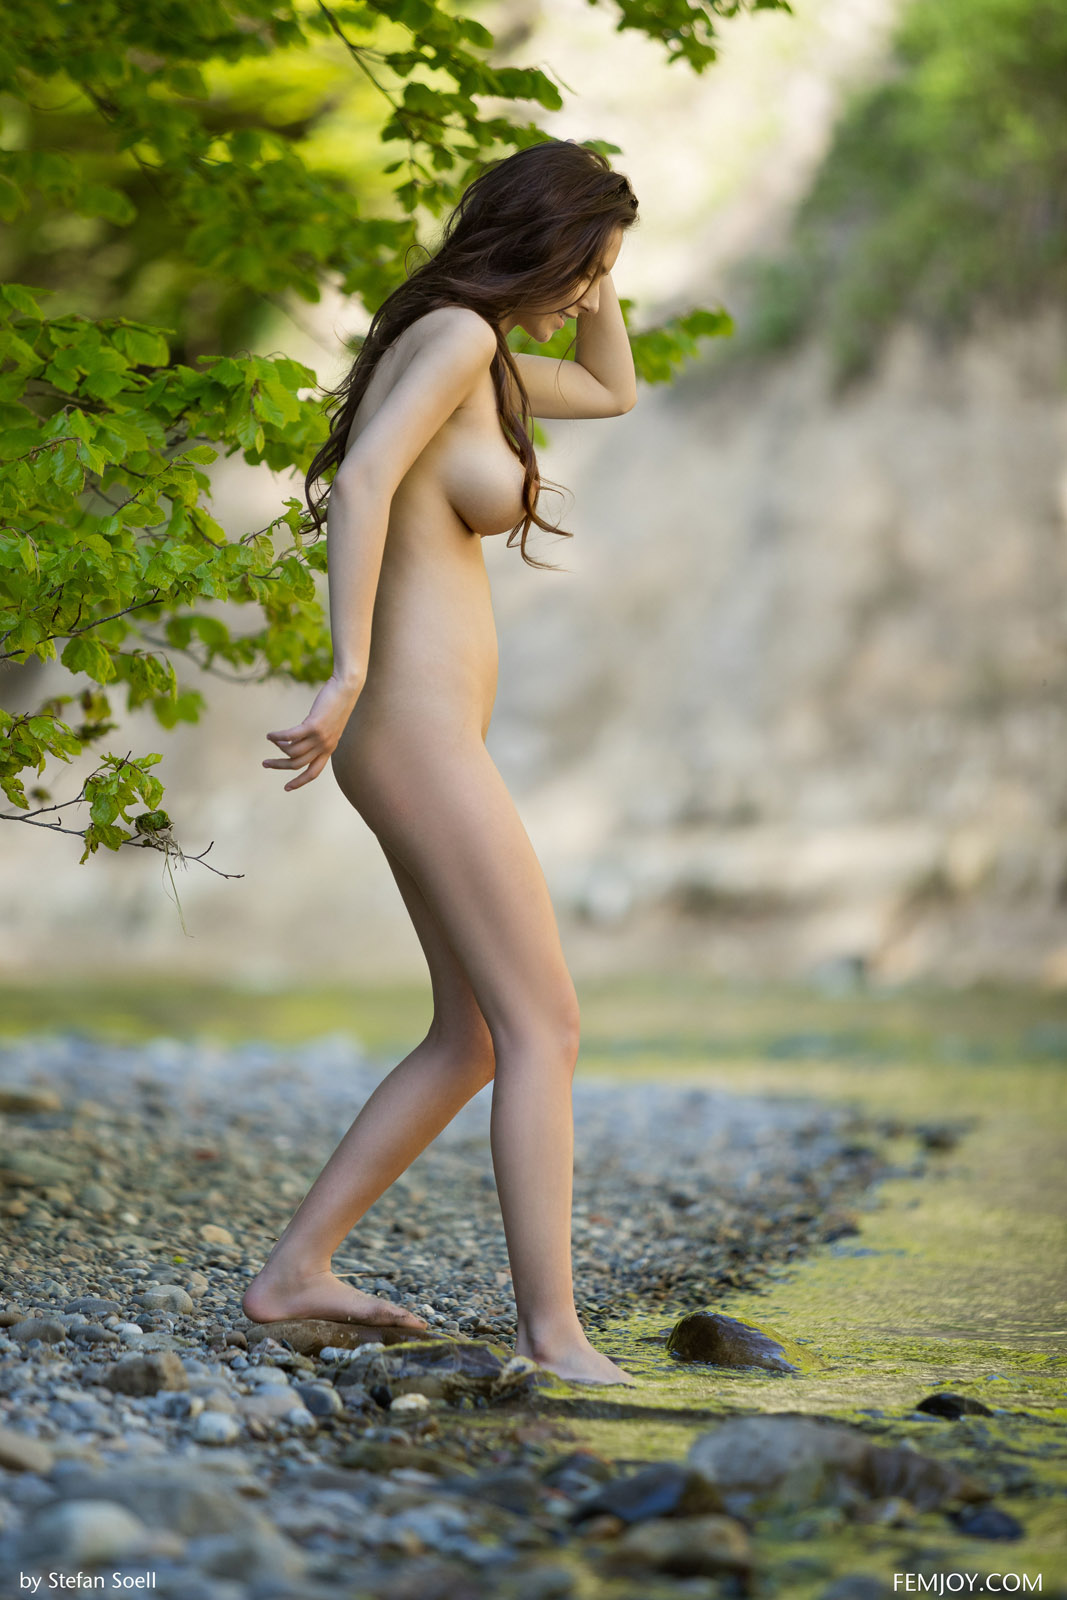 Enjoying nude